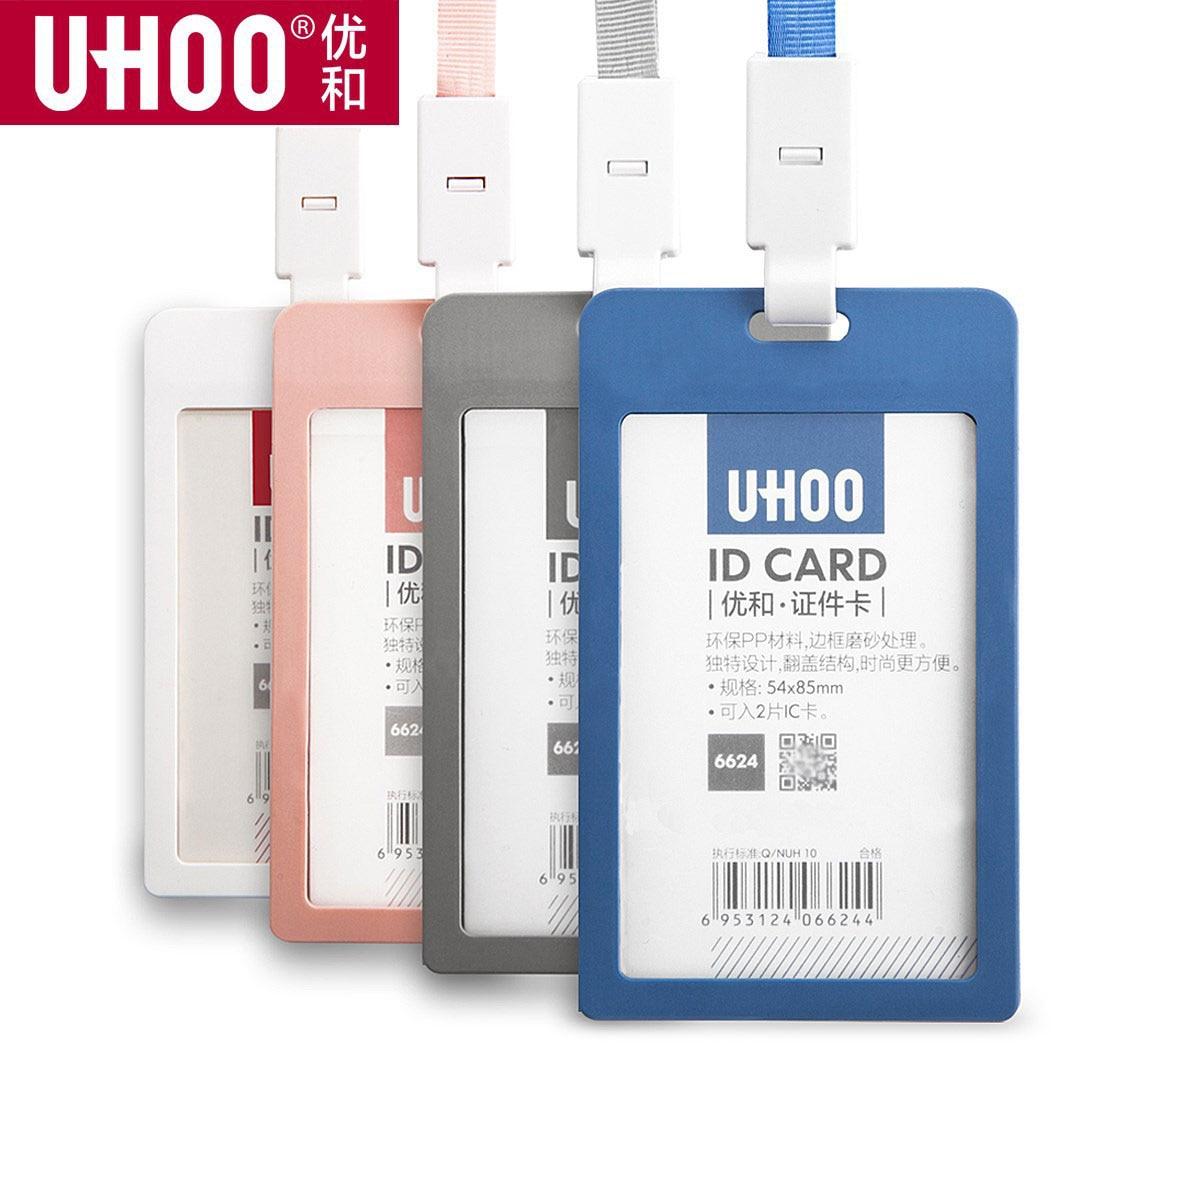 1 PC UHOO New High Quality Plastic ID Card Holder Retractable Badge Holder Skip Identity Badge Holders Wholesale